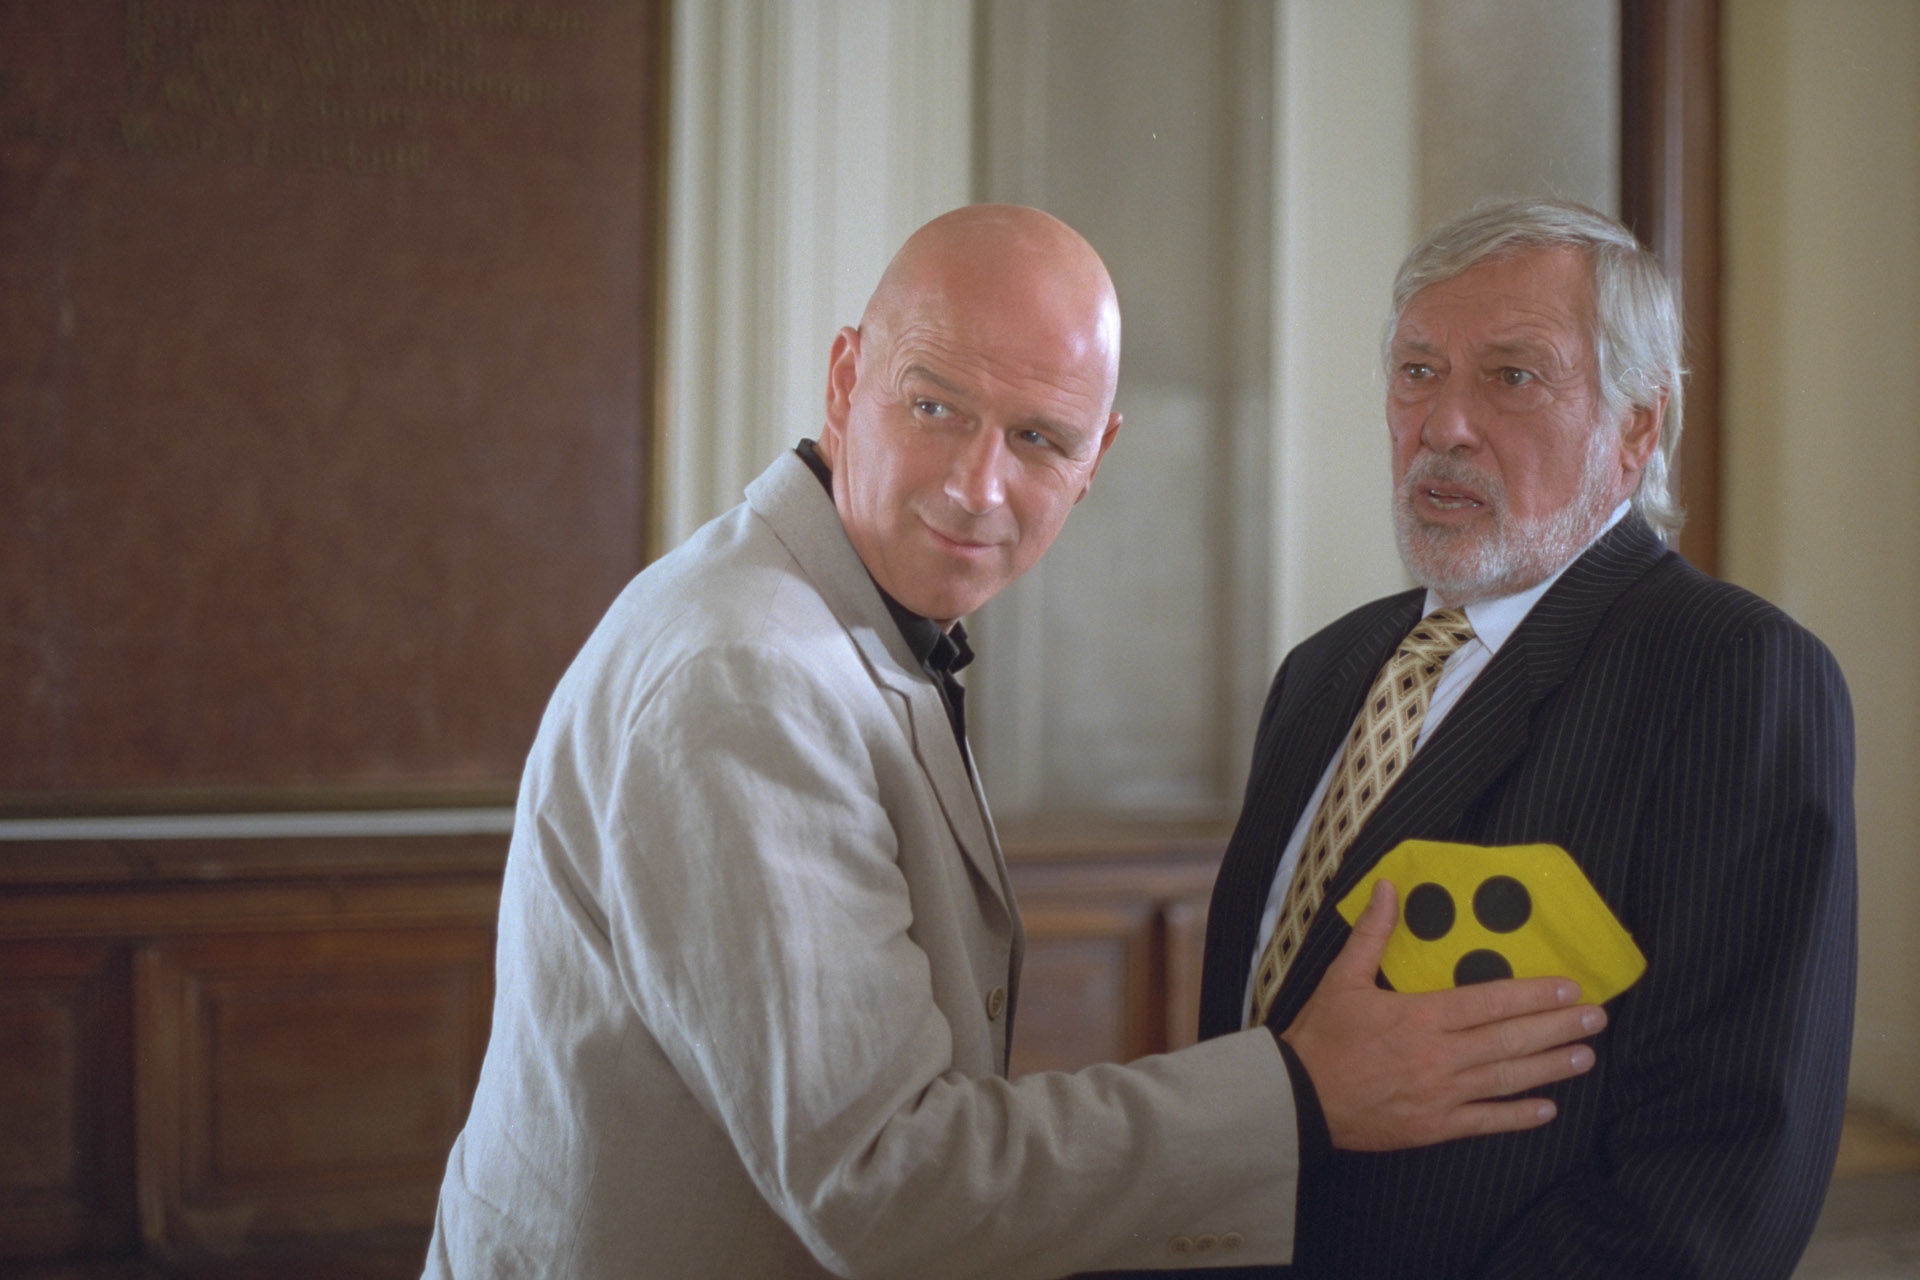 Alexander Goebel (Sigis Anwalt), Dietmar Schönherr (Renates Anwalt)